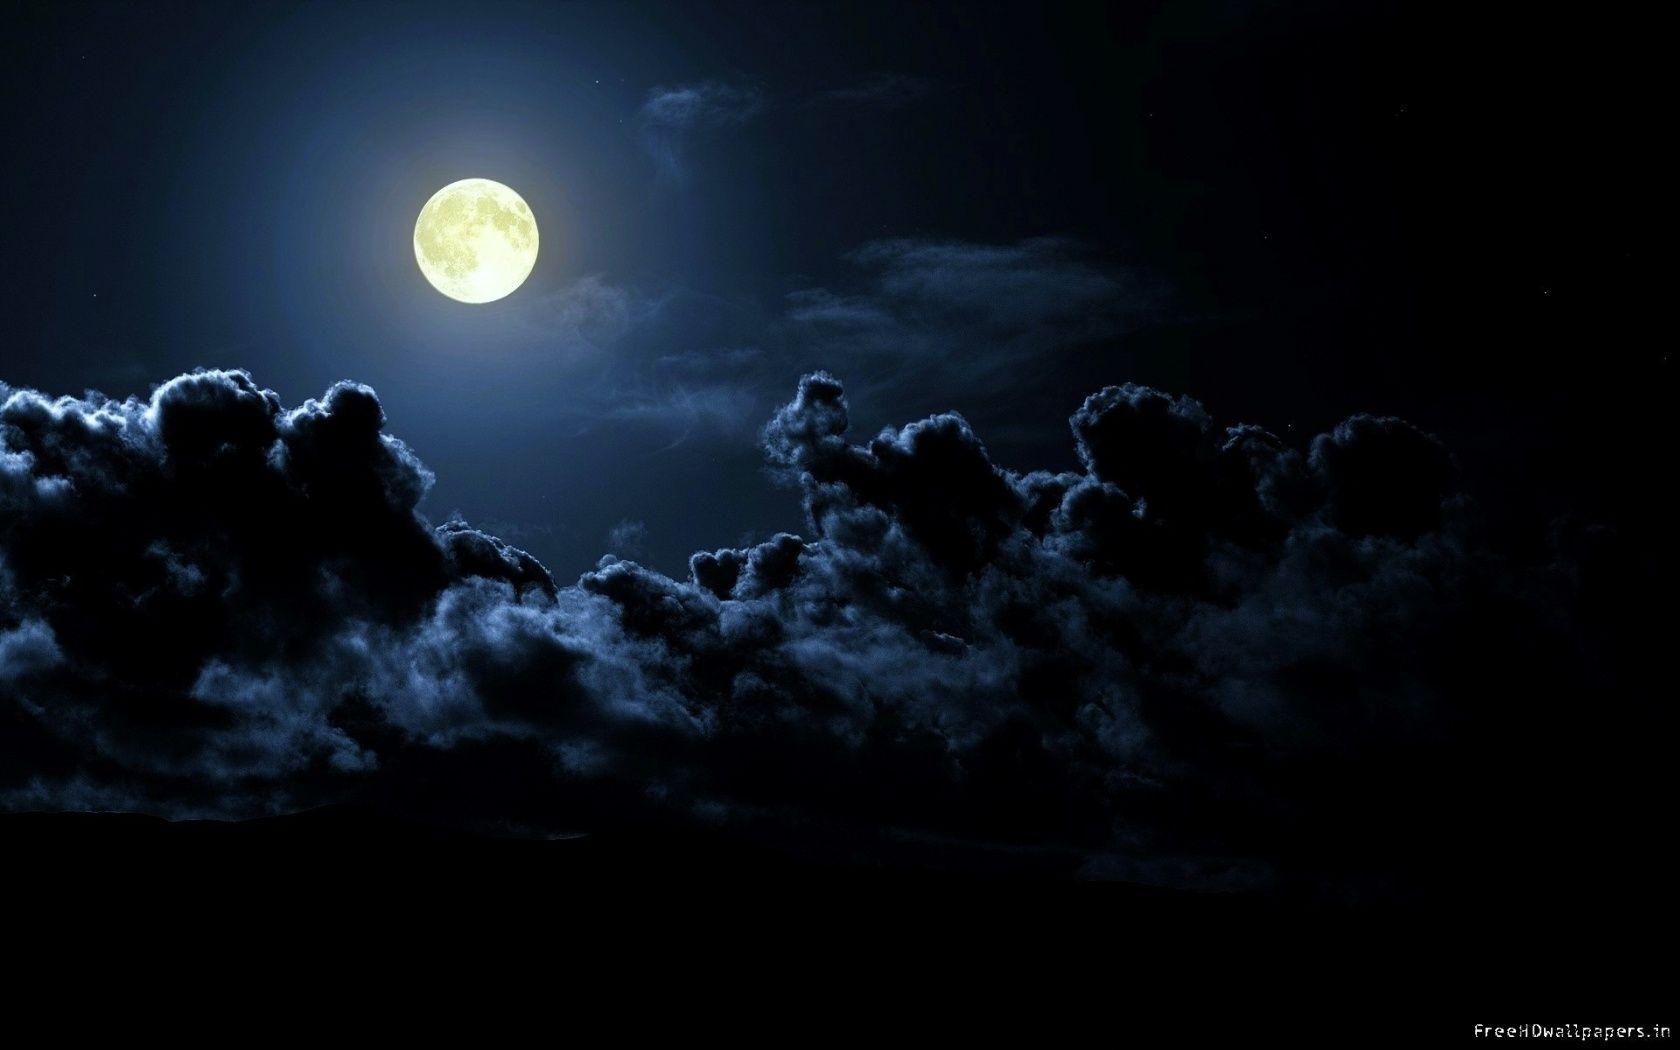 Hd wallpaper night - Be Free Hd Wallpaper Moonlight Night Sky Pinterest Free Hd Wallpapers Wallpaper And Free